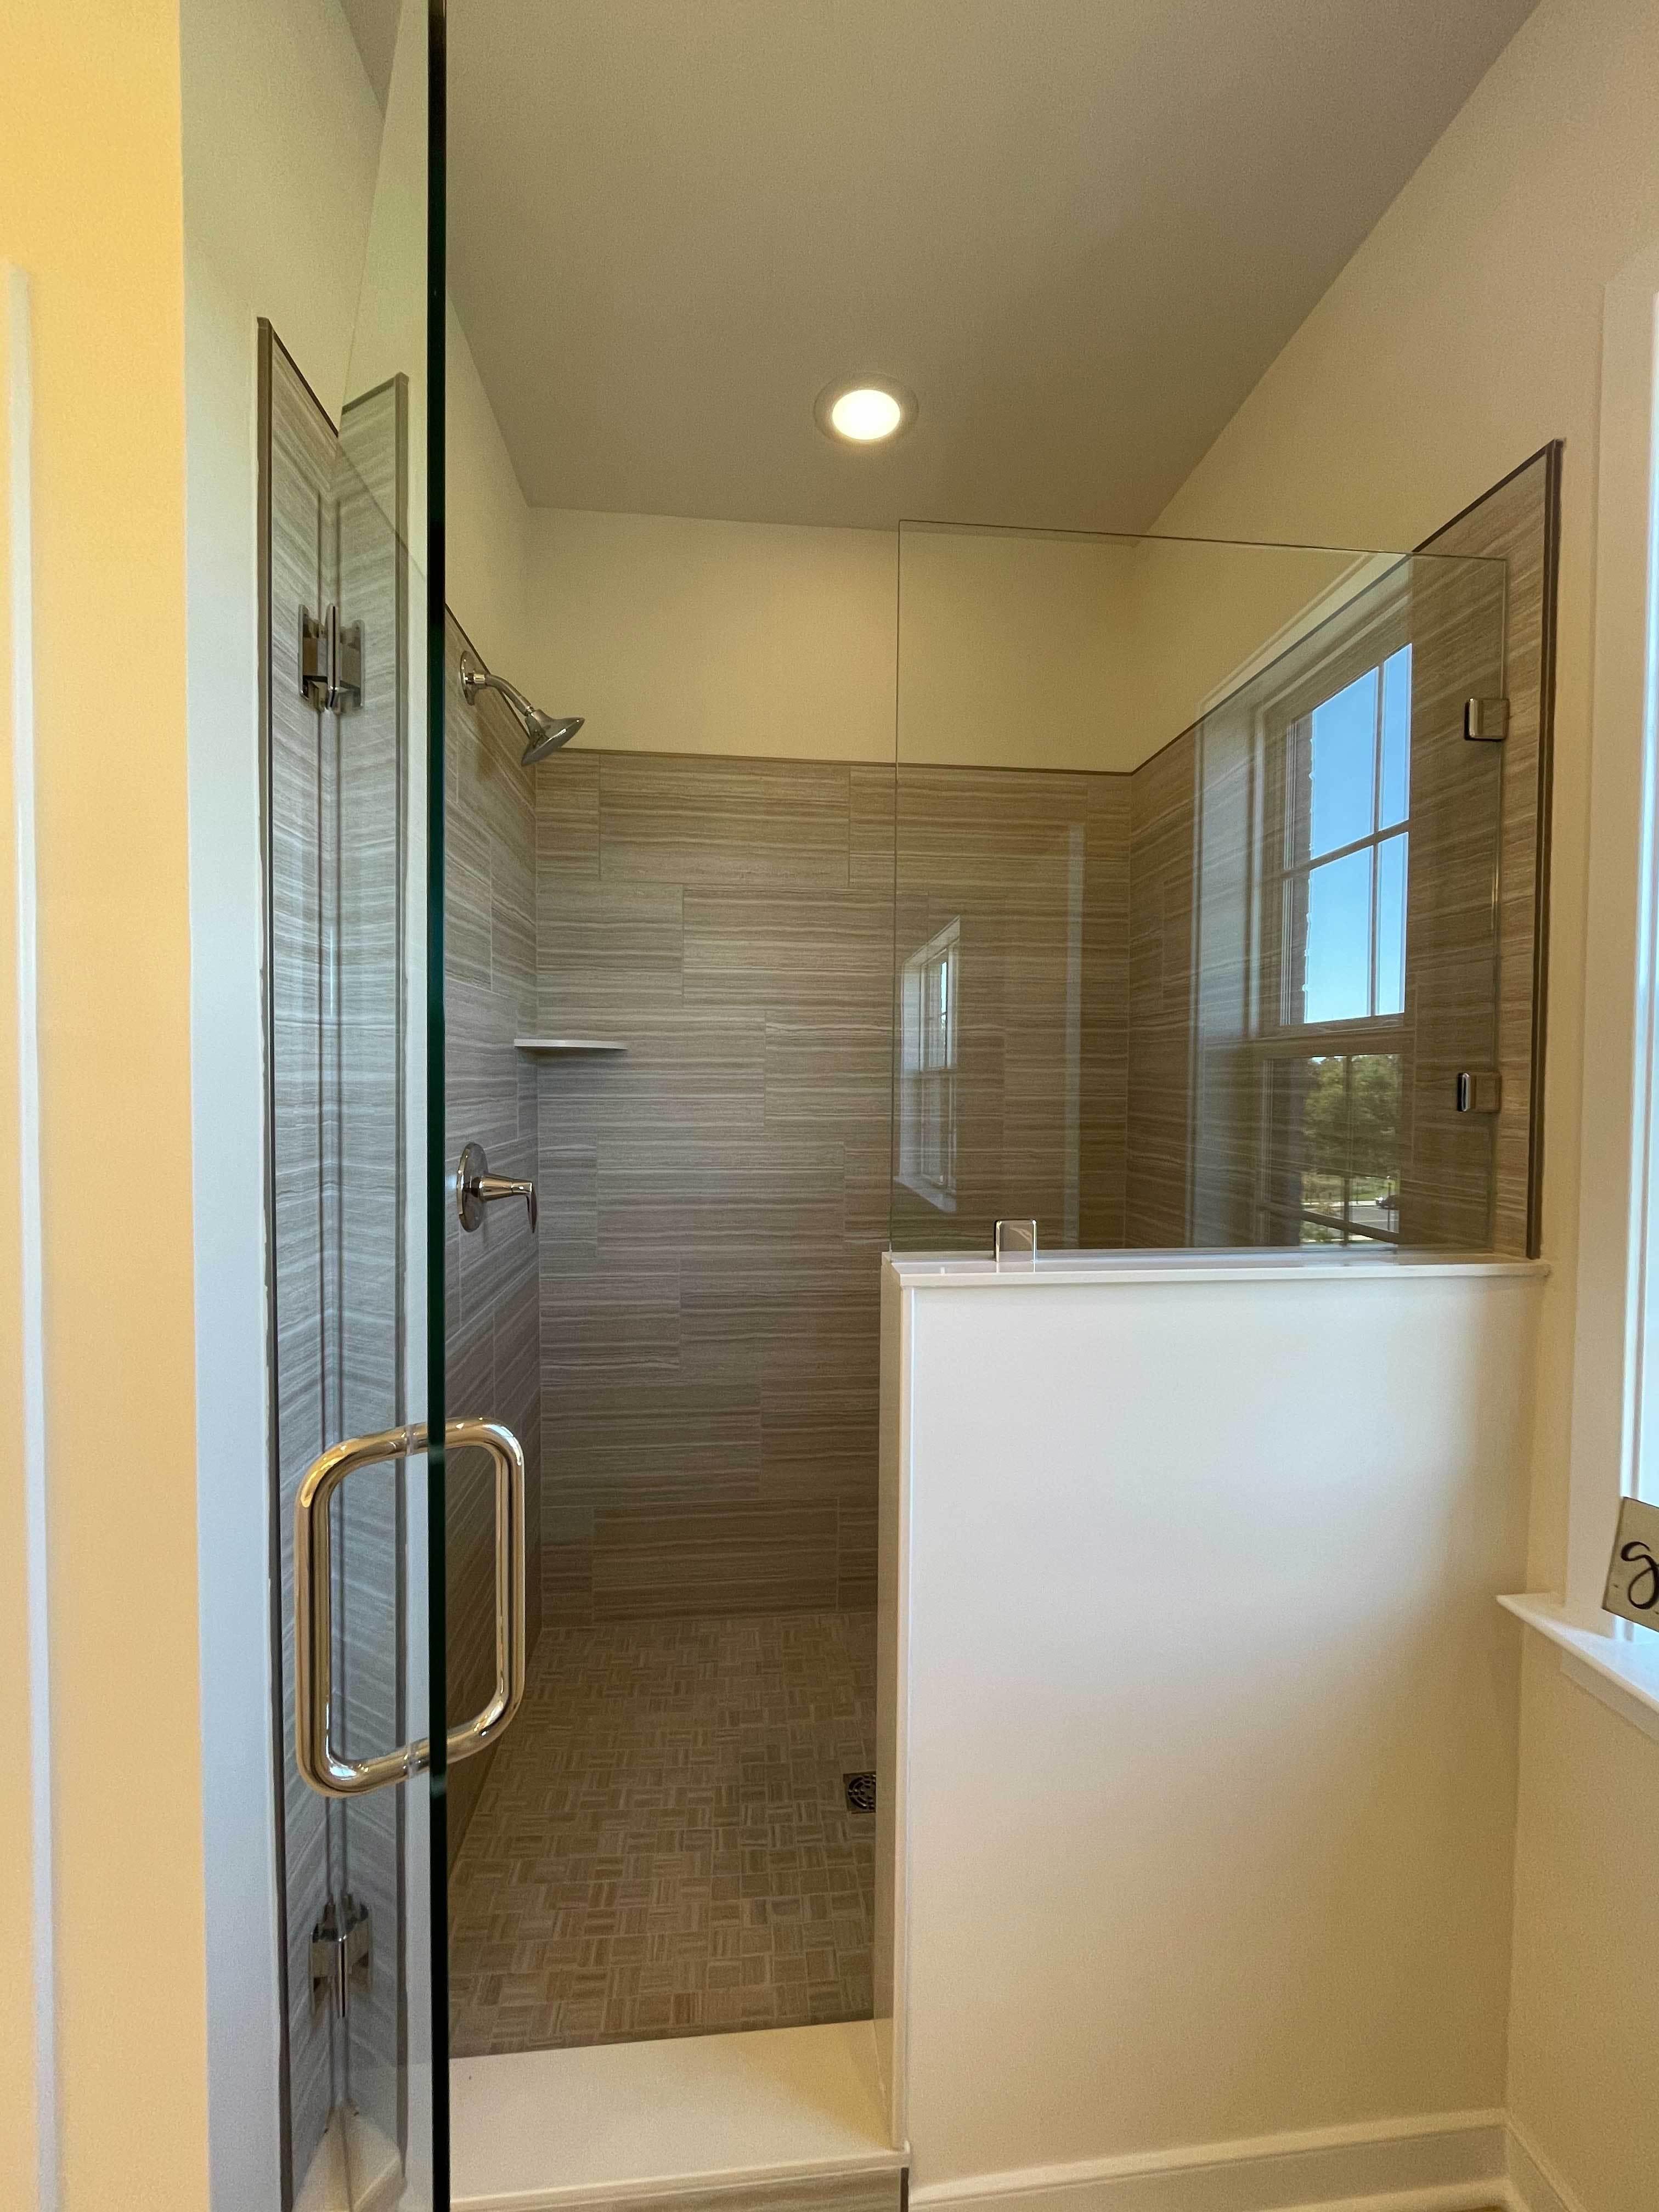 Bathroom featured in The Monroe By Gumenick Properties in Richmond-Petersburg, VA